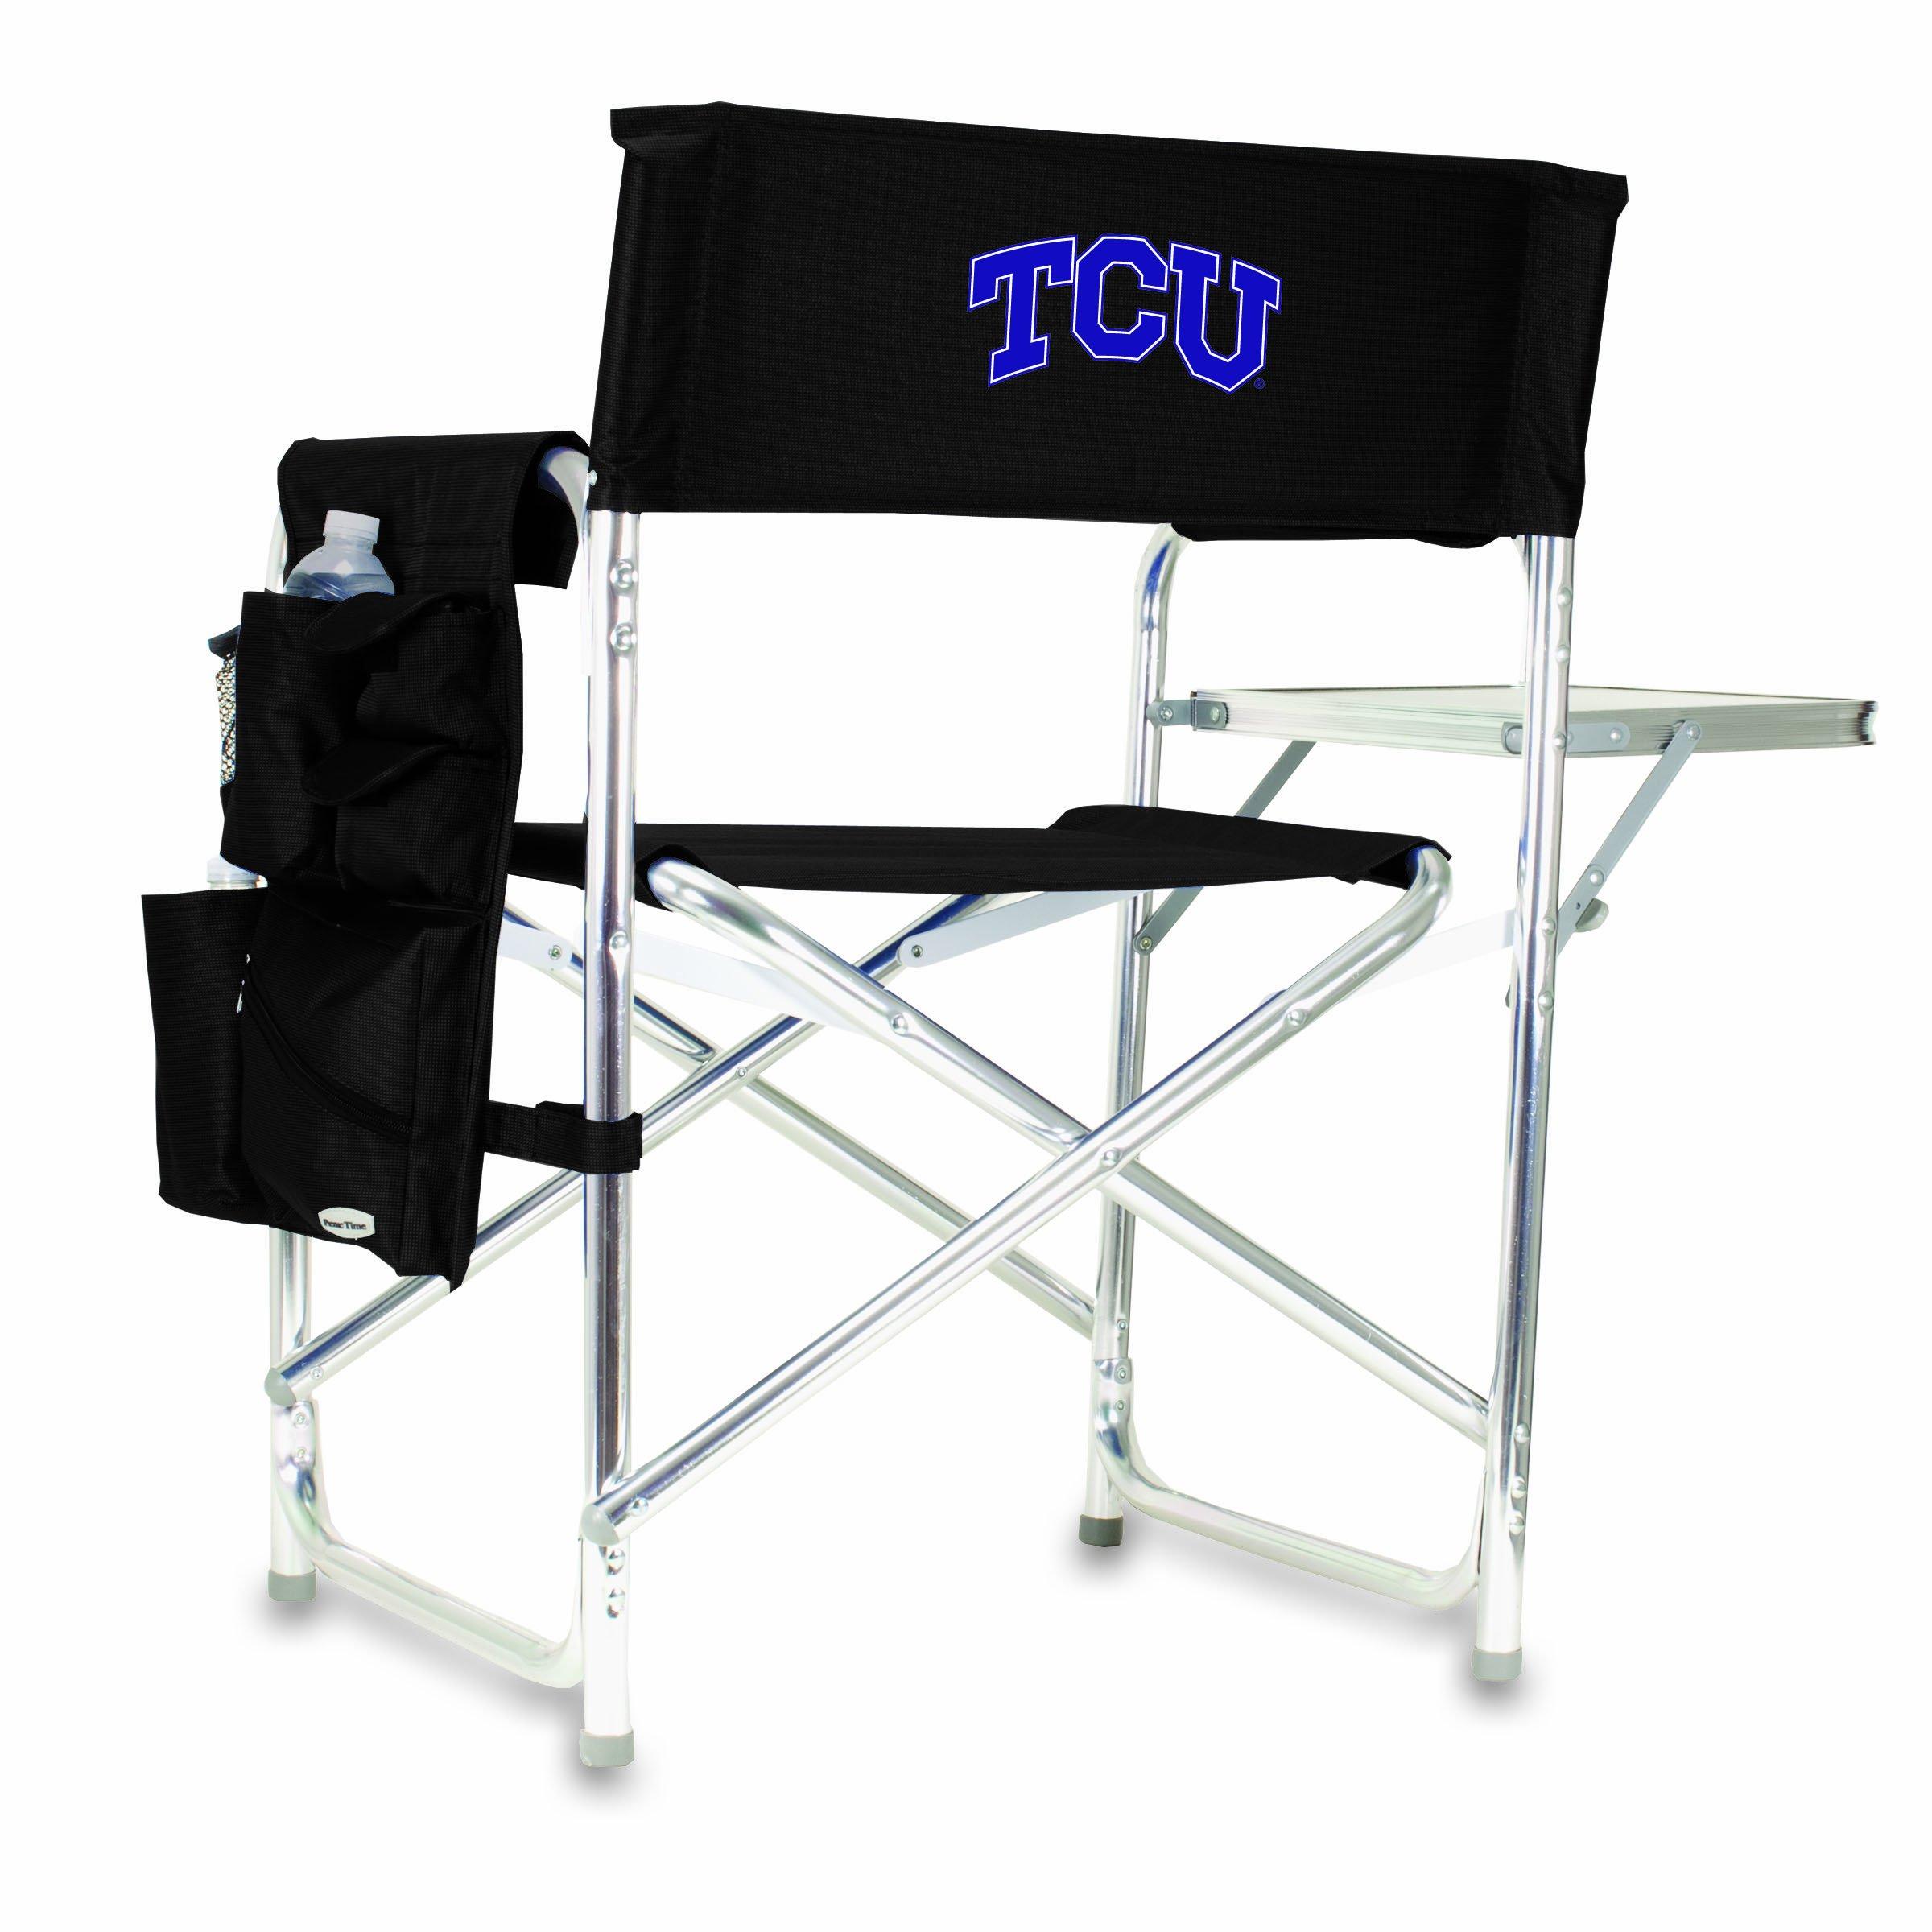 NCAA Texas Christian Horned Frogs Portable Folding Sports Chair (Black)